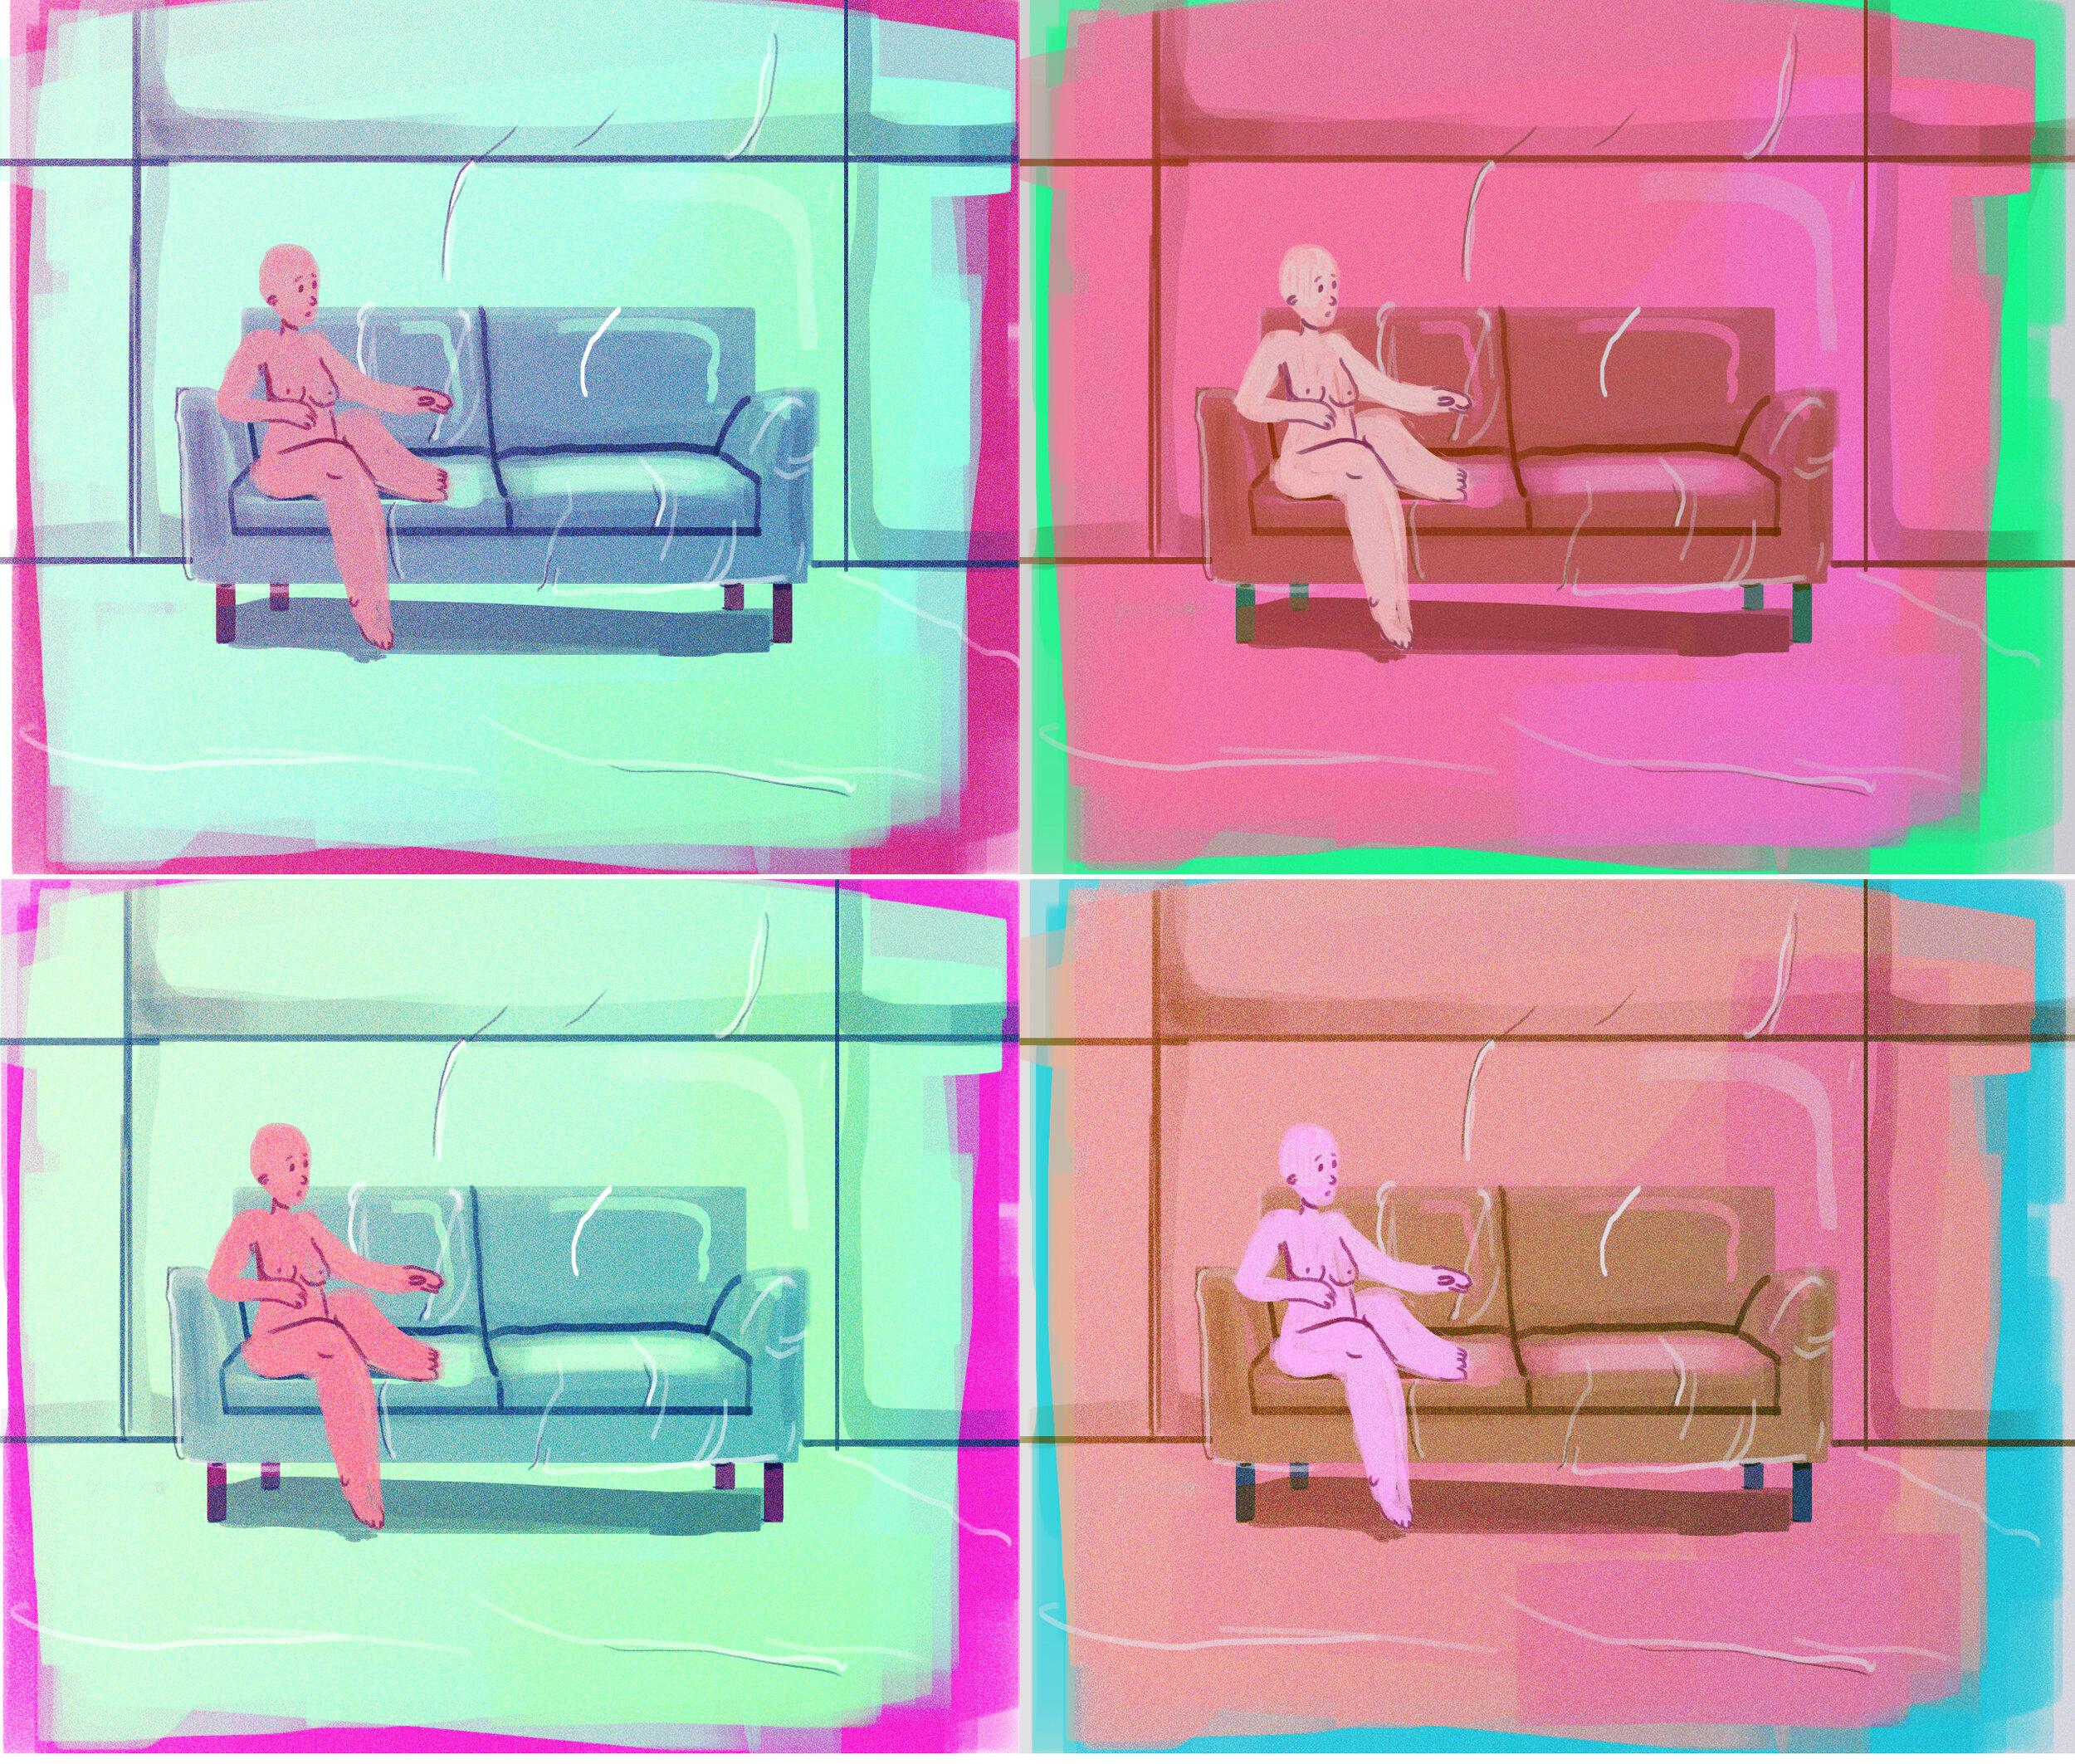 lounge concepts30.jpg